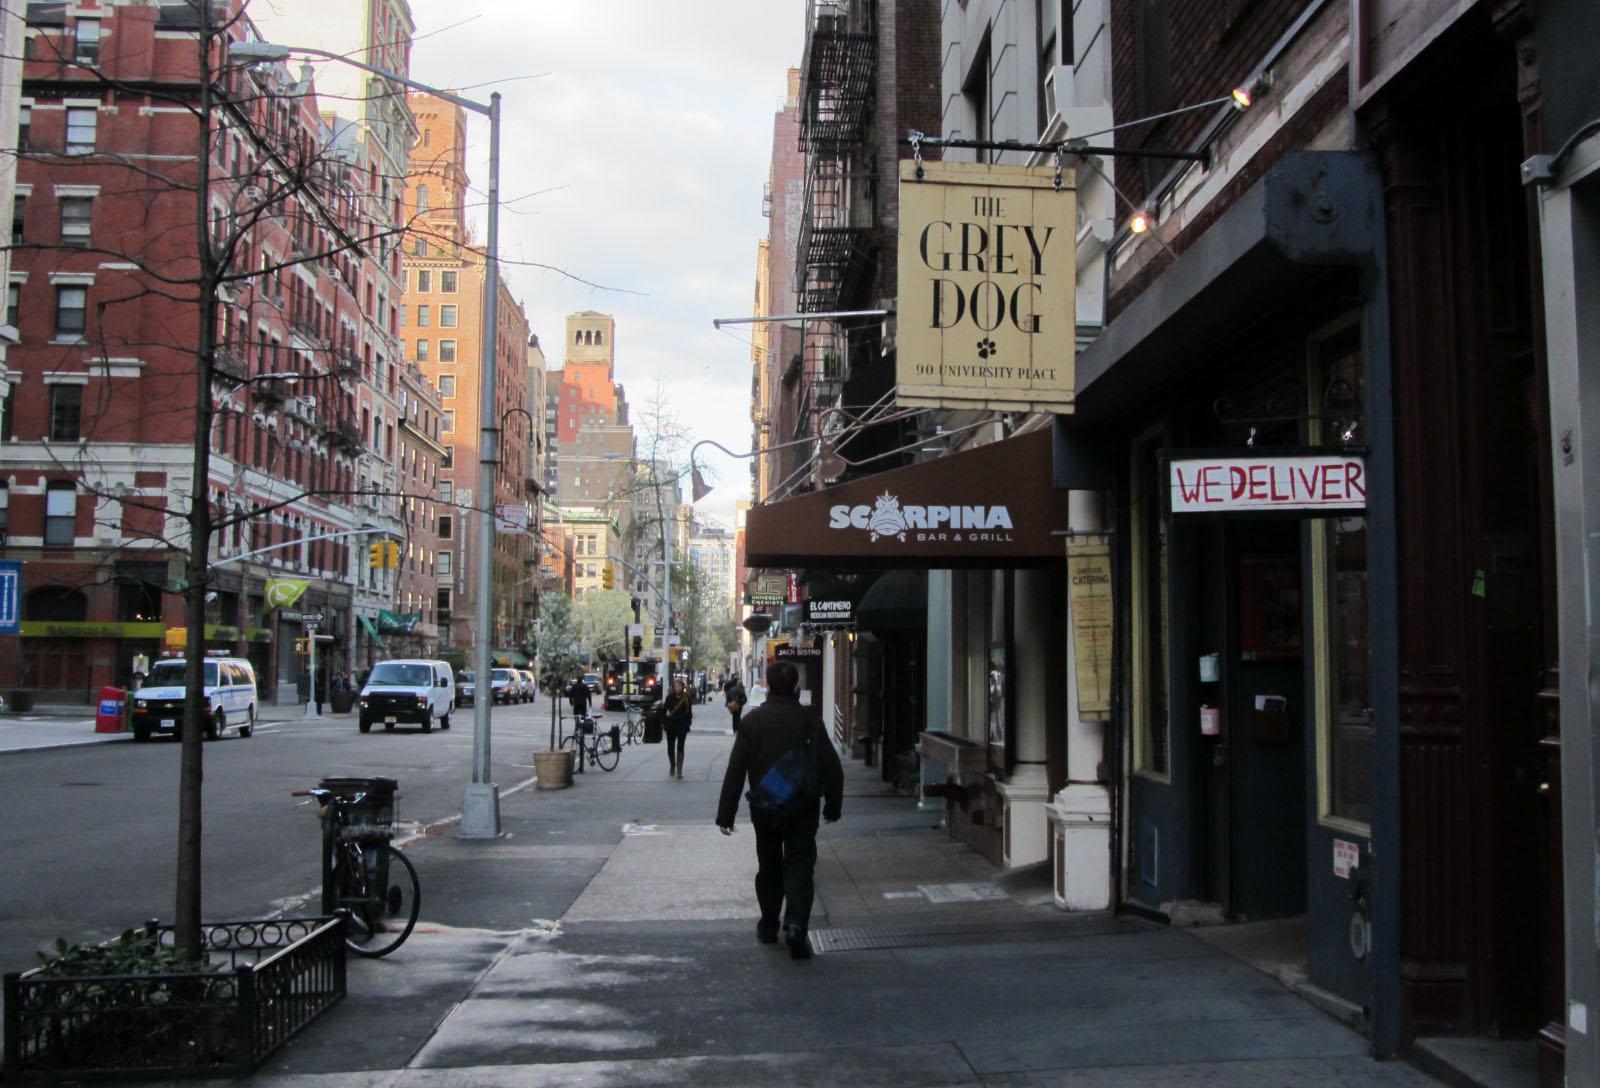 Grey Dog Bedford And Carmine : New york eating breakfast at grey dog coffee elaine is